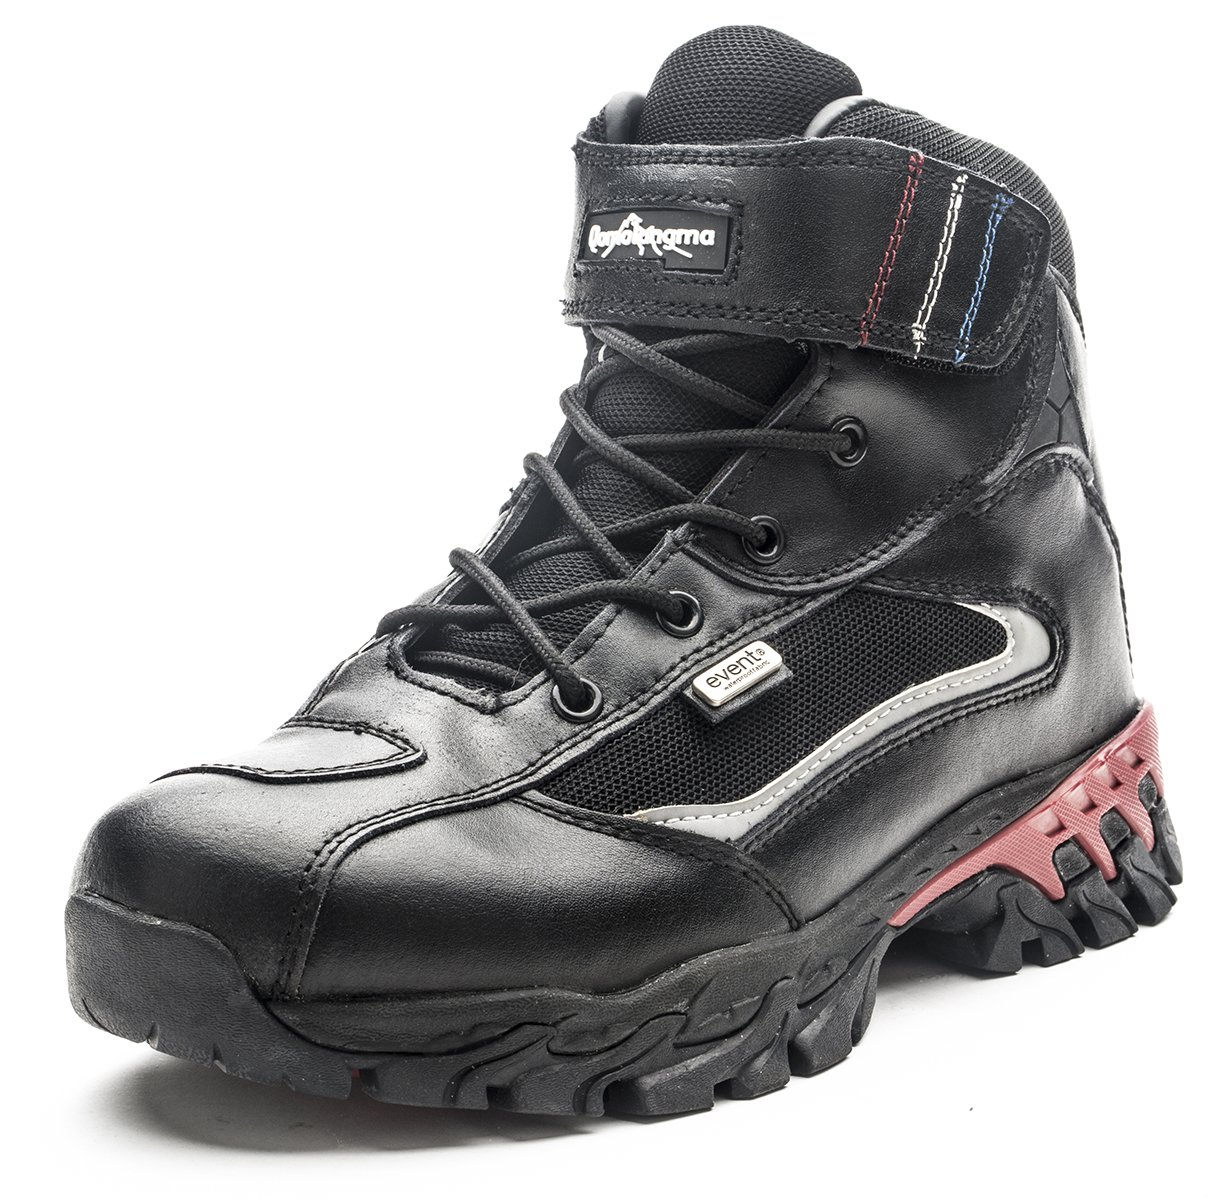 QOMOLANGMA Men's Waterproof Leather Motorcycle Combat Ankle Boots Hiking Trekking Outdoor Boots B01HI57HKK 9.5 M US|Black/Red